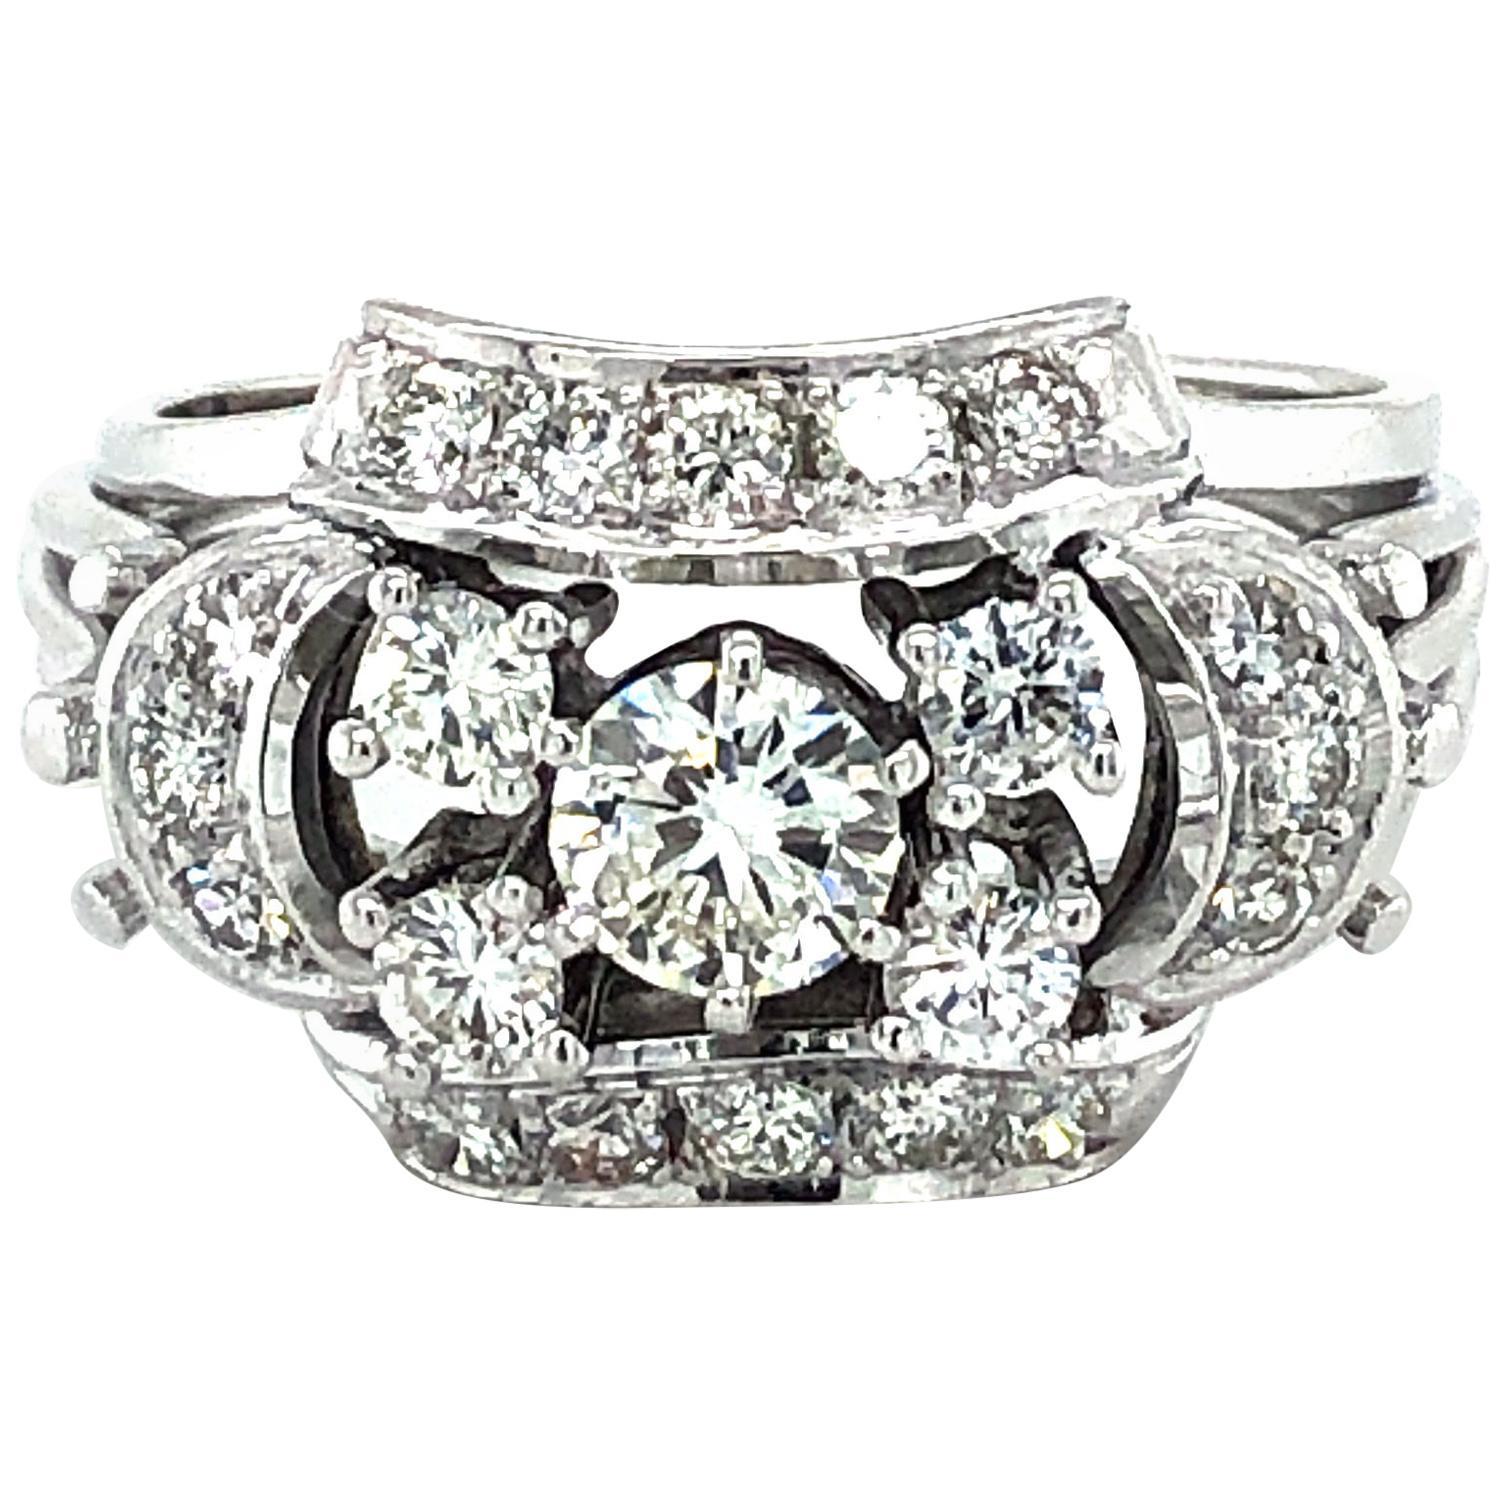 Stylish 1960s Diamond Ring in 18 Karat White Gold